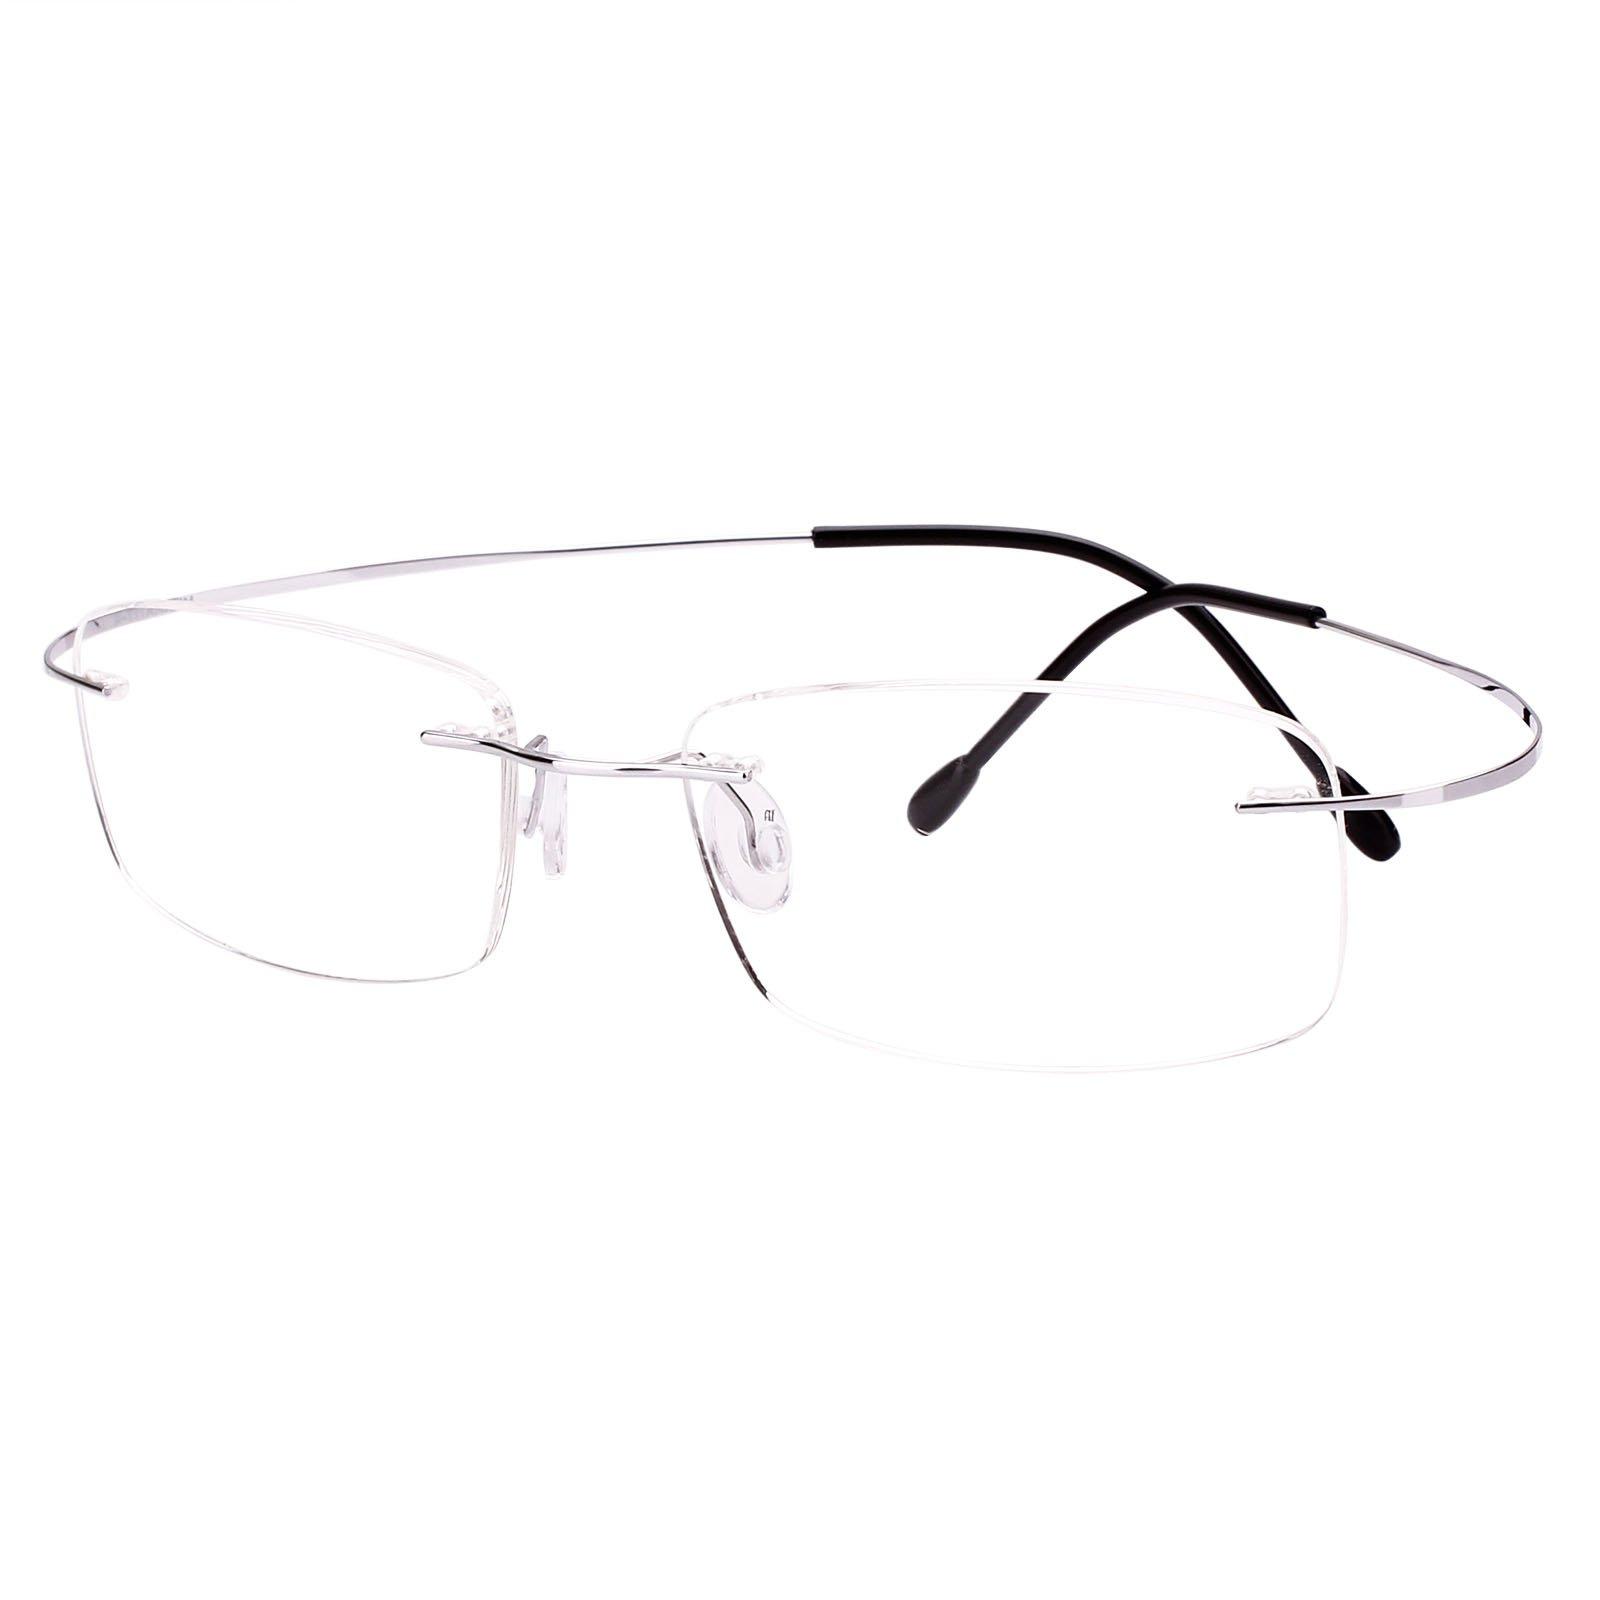 Agstum Pure Titanium Rimless Frame Prescription Hingeless Eyeglasses Rx (Silver, Non-Prescription Clear Lens / 52)